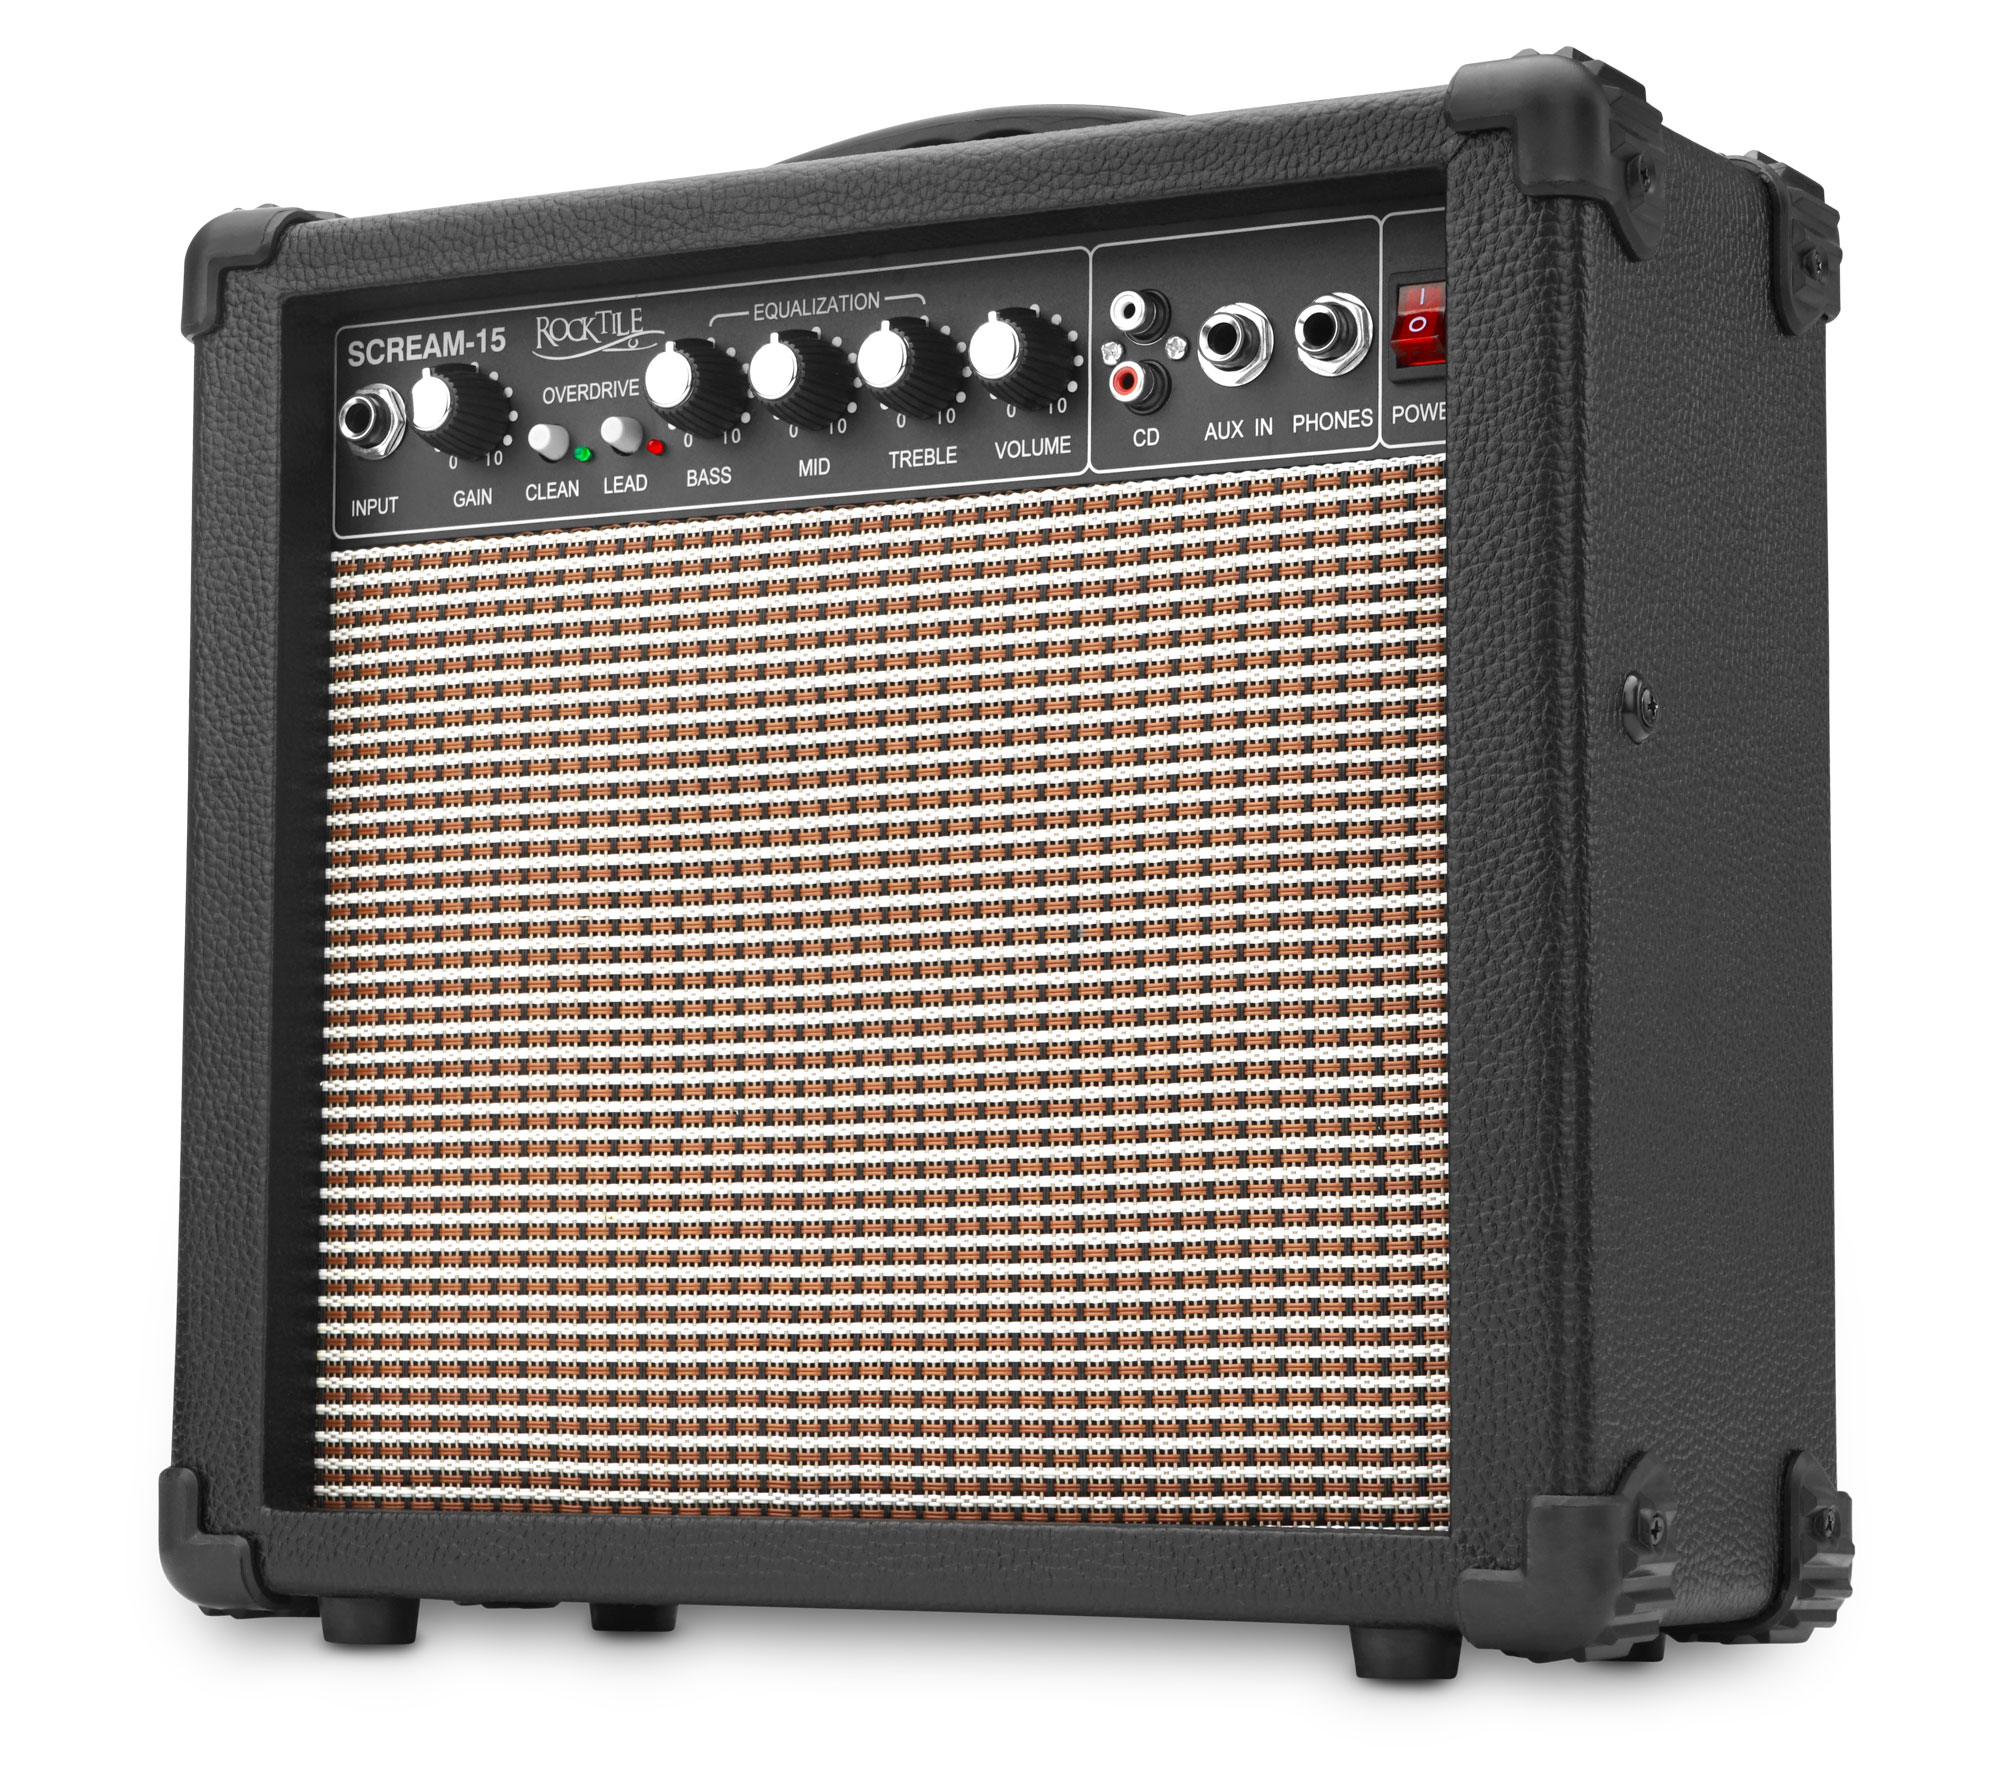 rocktile scream 15 mini guitar amplifier combo amp 15 watt amplifier 2 channel portable aux. Black Bedroom Furniture Sets. Home Design Ideas